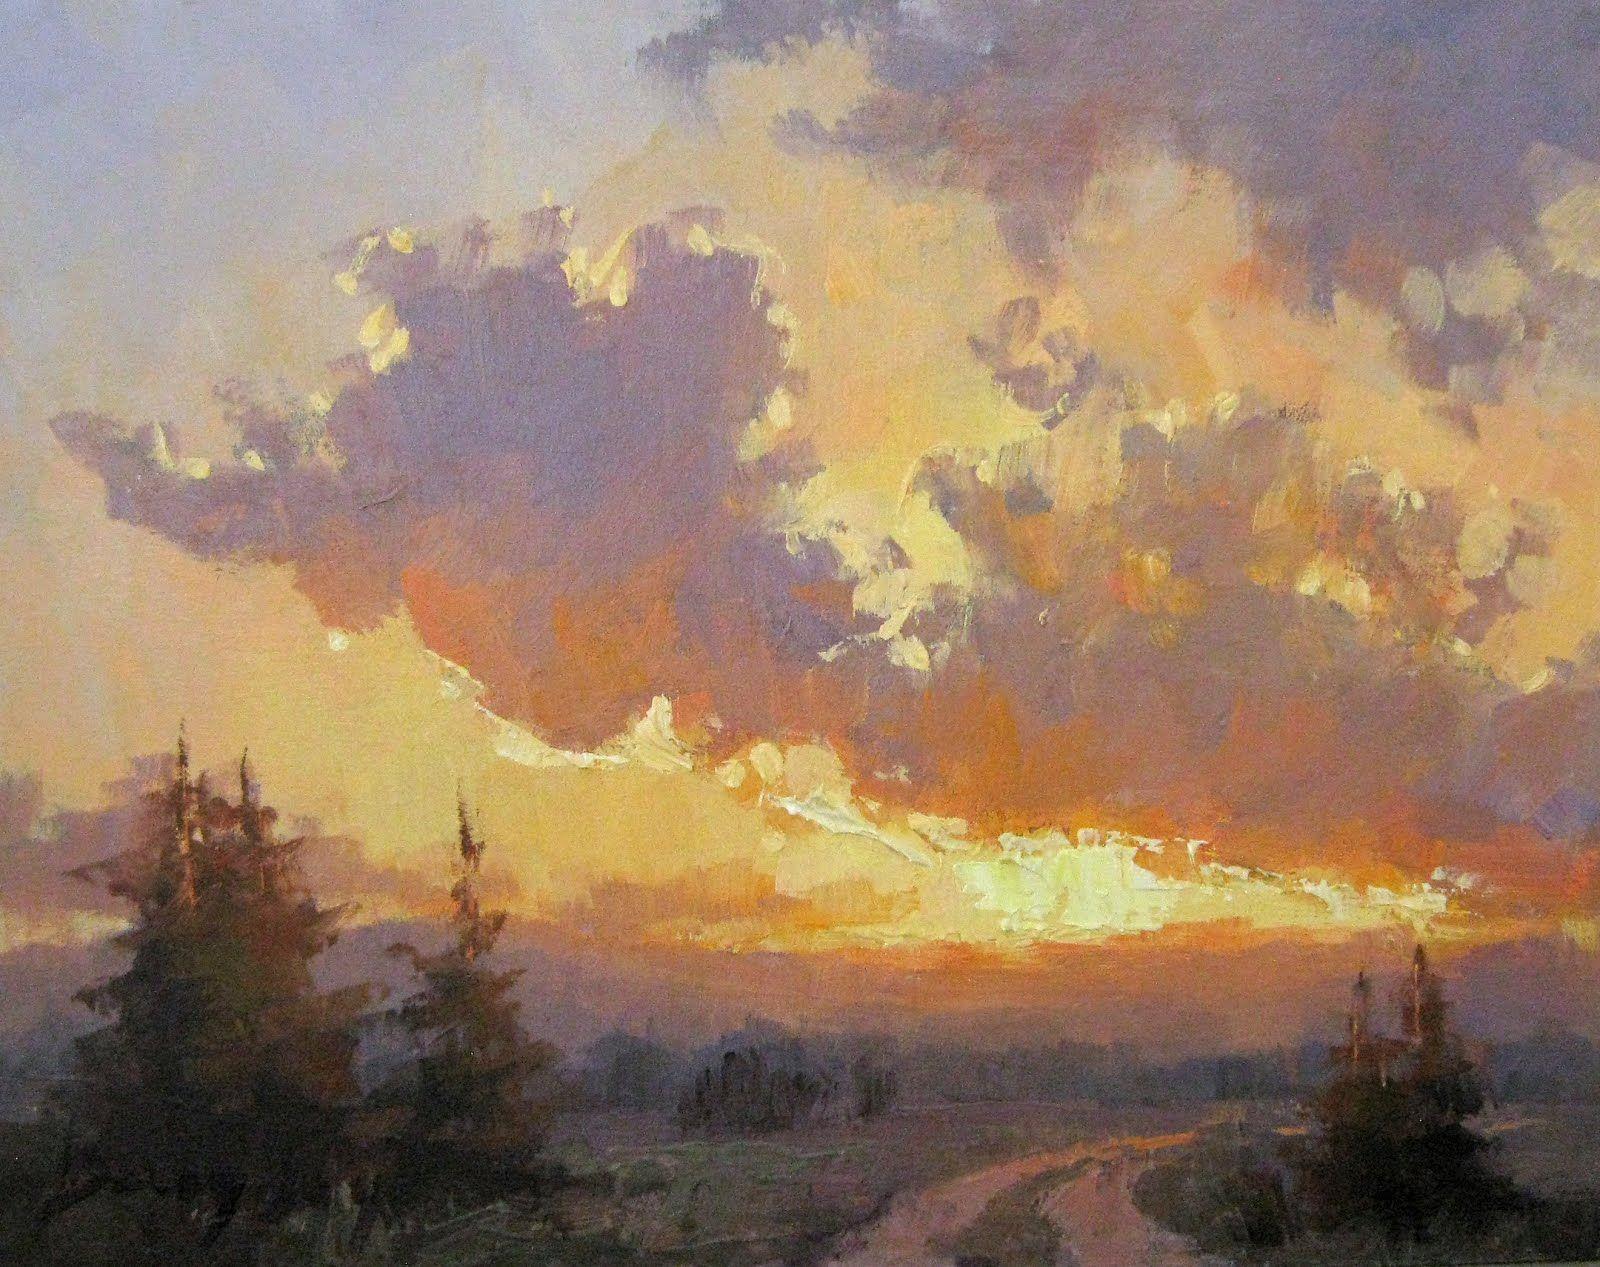 Becky Joy Sunset 6x6 Oil Painting 200 Description From